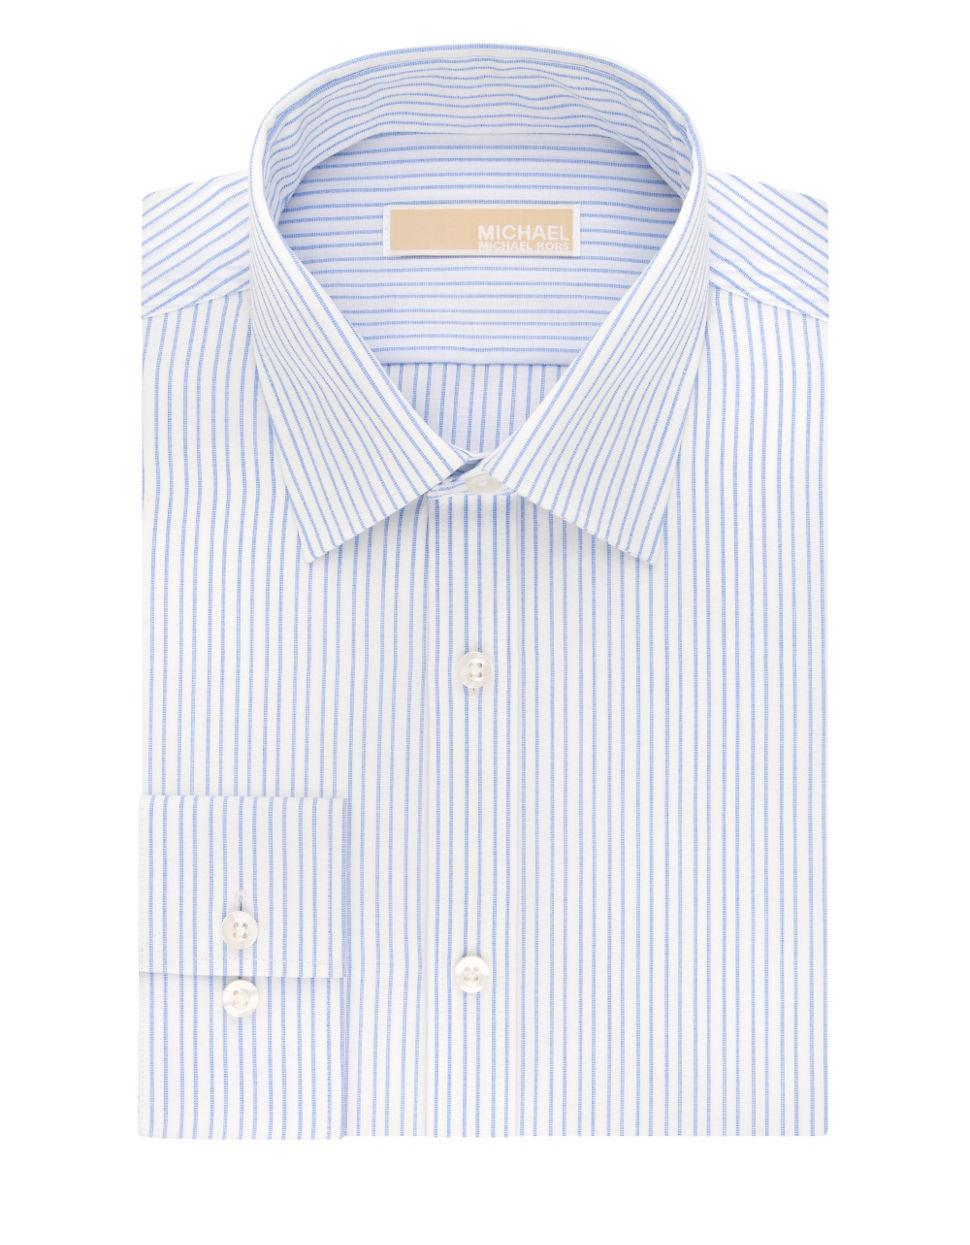 Michael Michael Kors Regular Fit Cotton Striped Dress